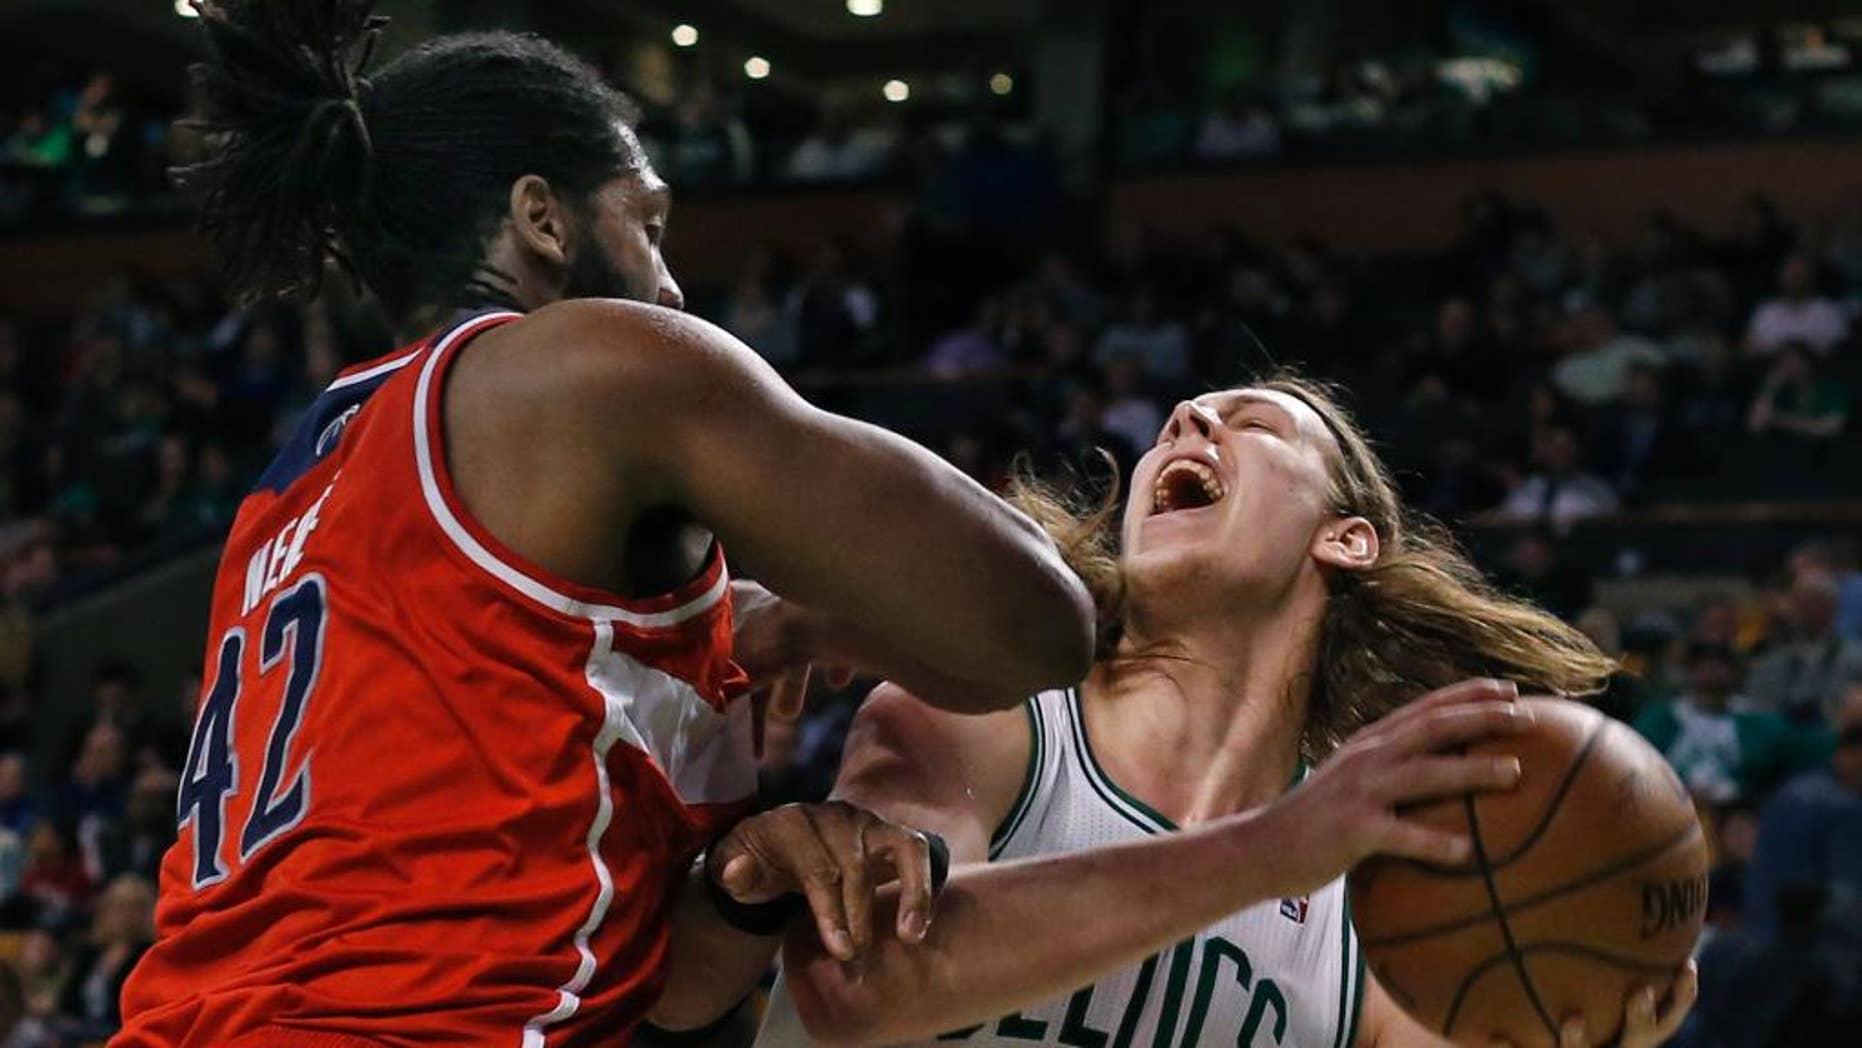 Boston Celtics center Kelly Olynyk (41) goes up to shoot against Washington Wizards forward Nene Hilario (42) during the second half of an NBA basketball game in Boston, Wednesday, April 16, 2014. The Wizards won 118-102. (AP Photo/Elise Amendola)